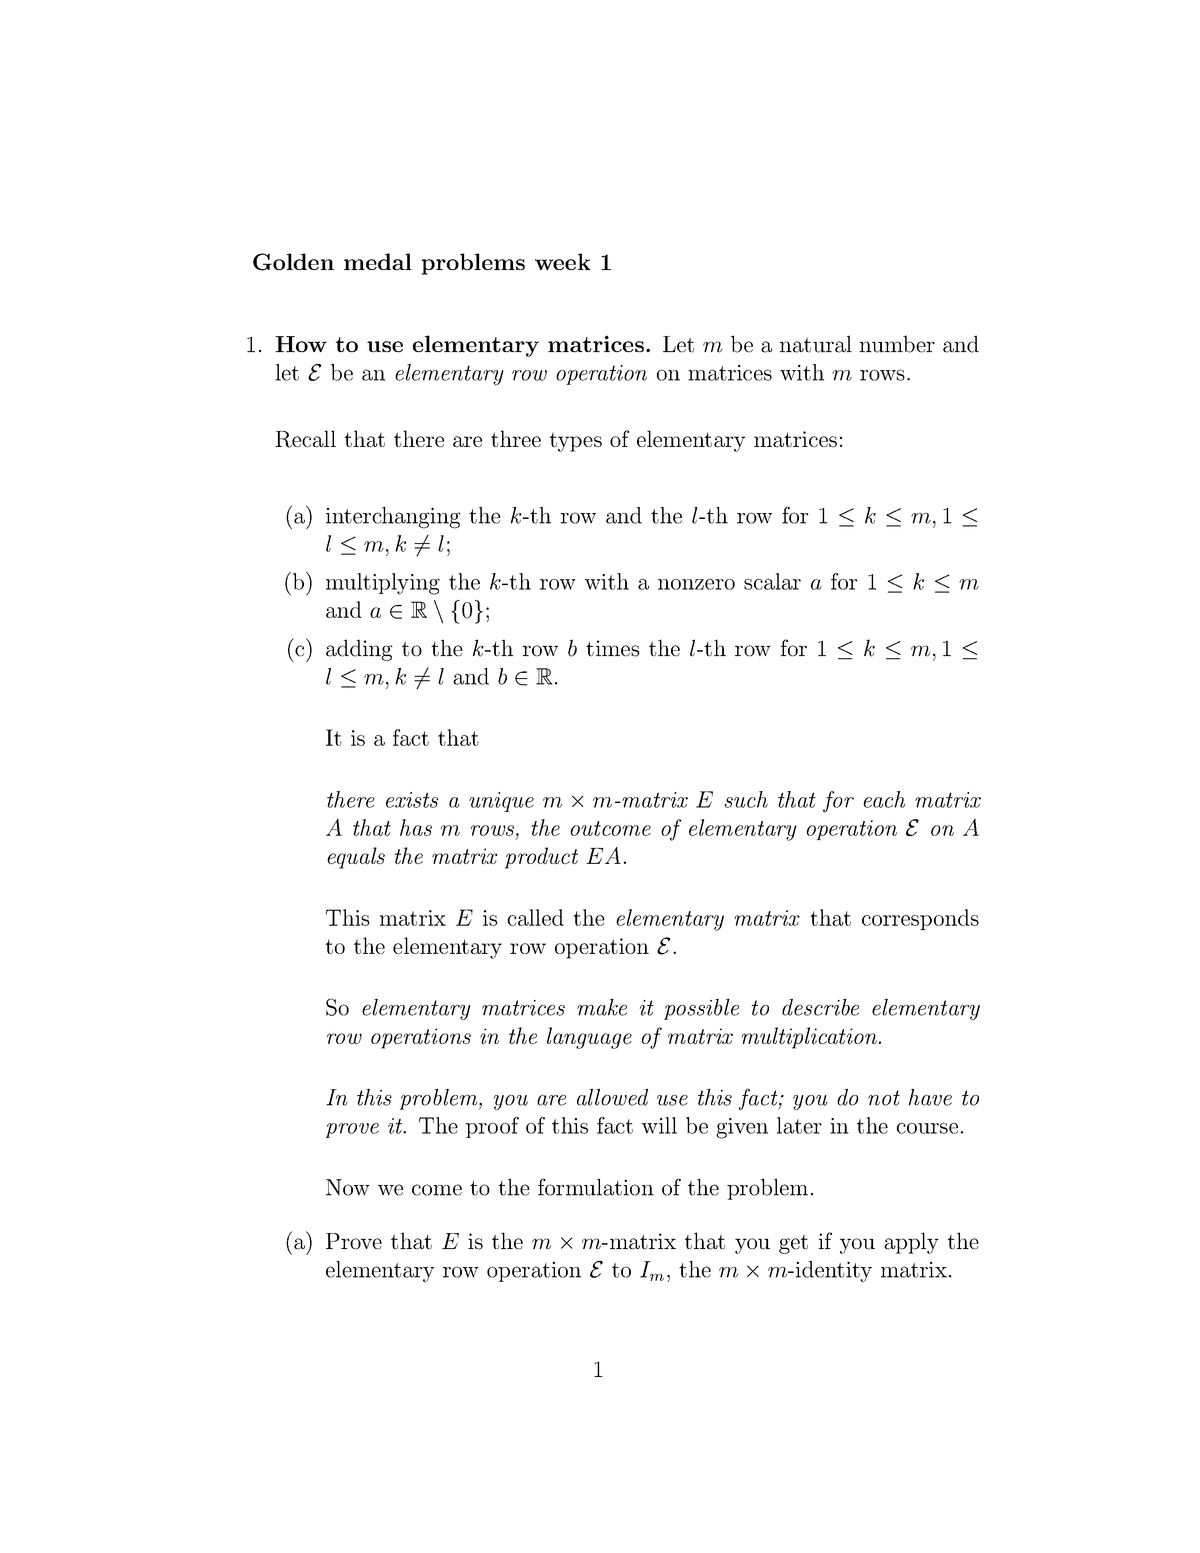 Two golden medal problems (week 1)(1) - FEB21019: Matrix